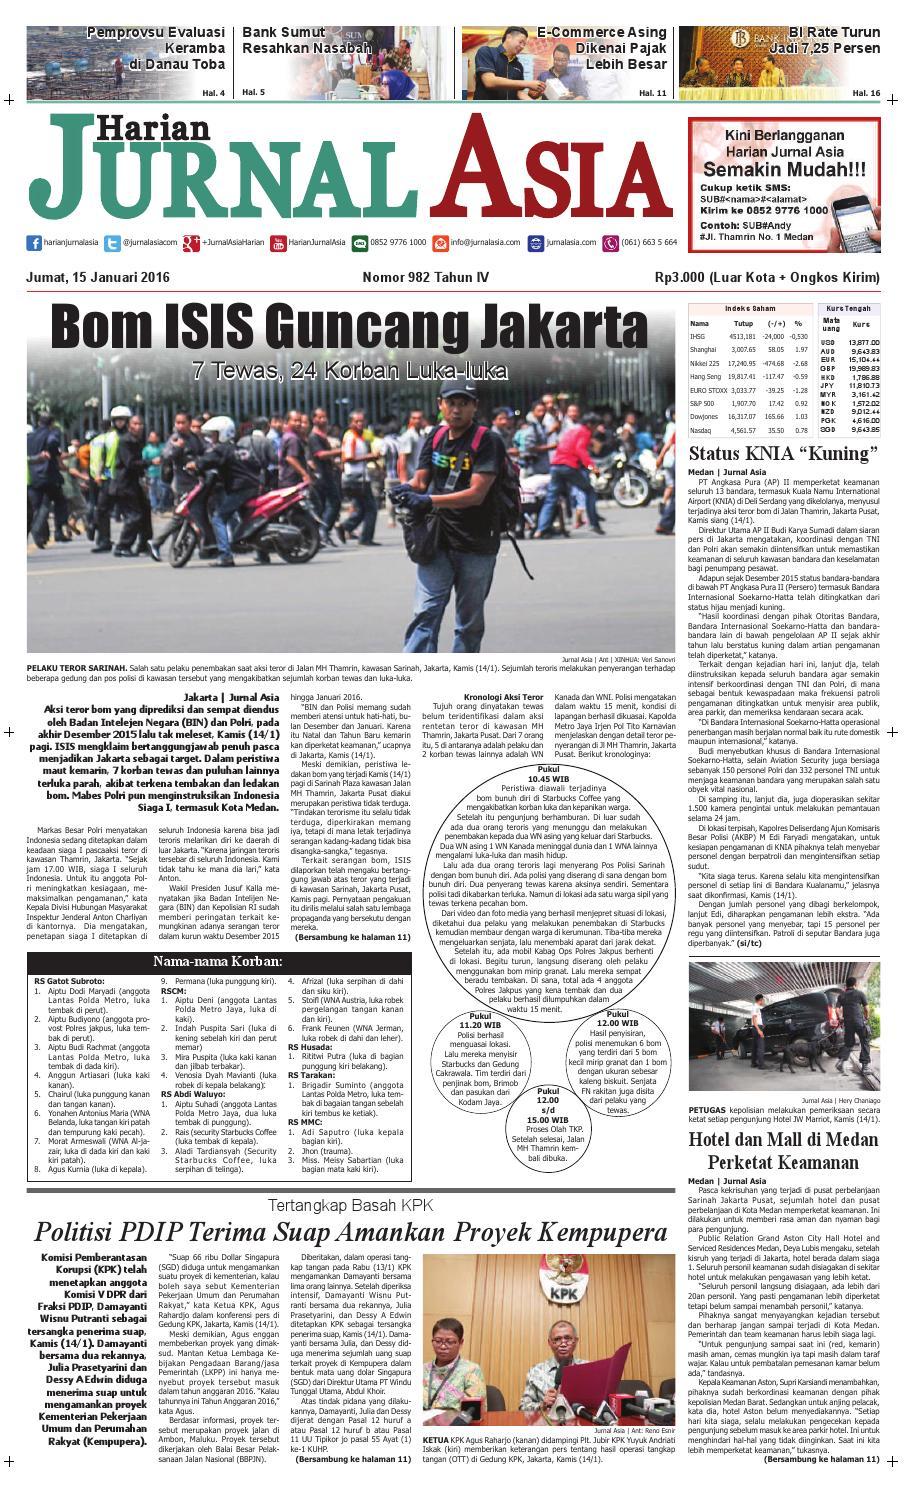 Harian Jurnal Asia Edisi Jumat 961b6adc3d